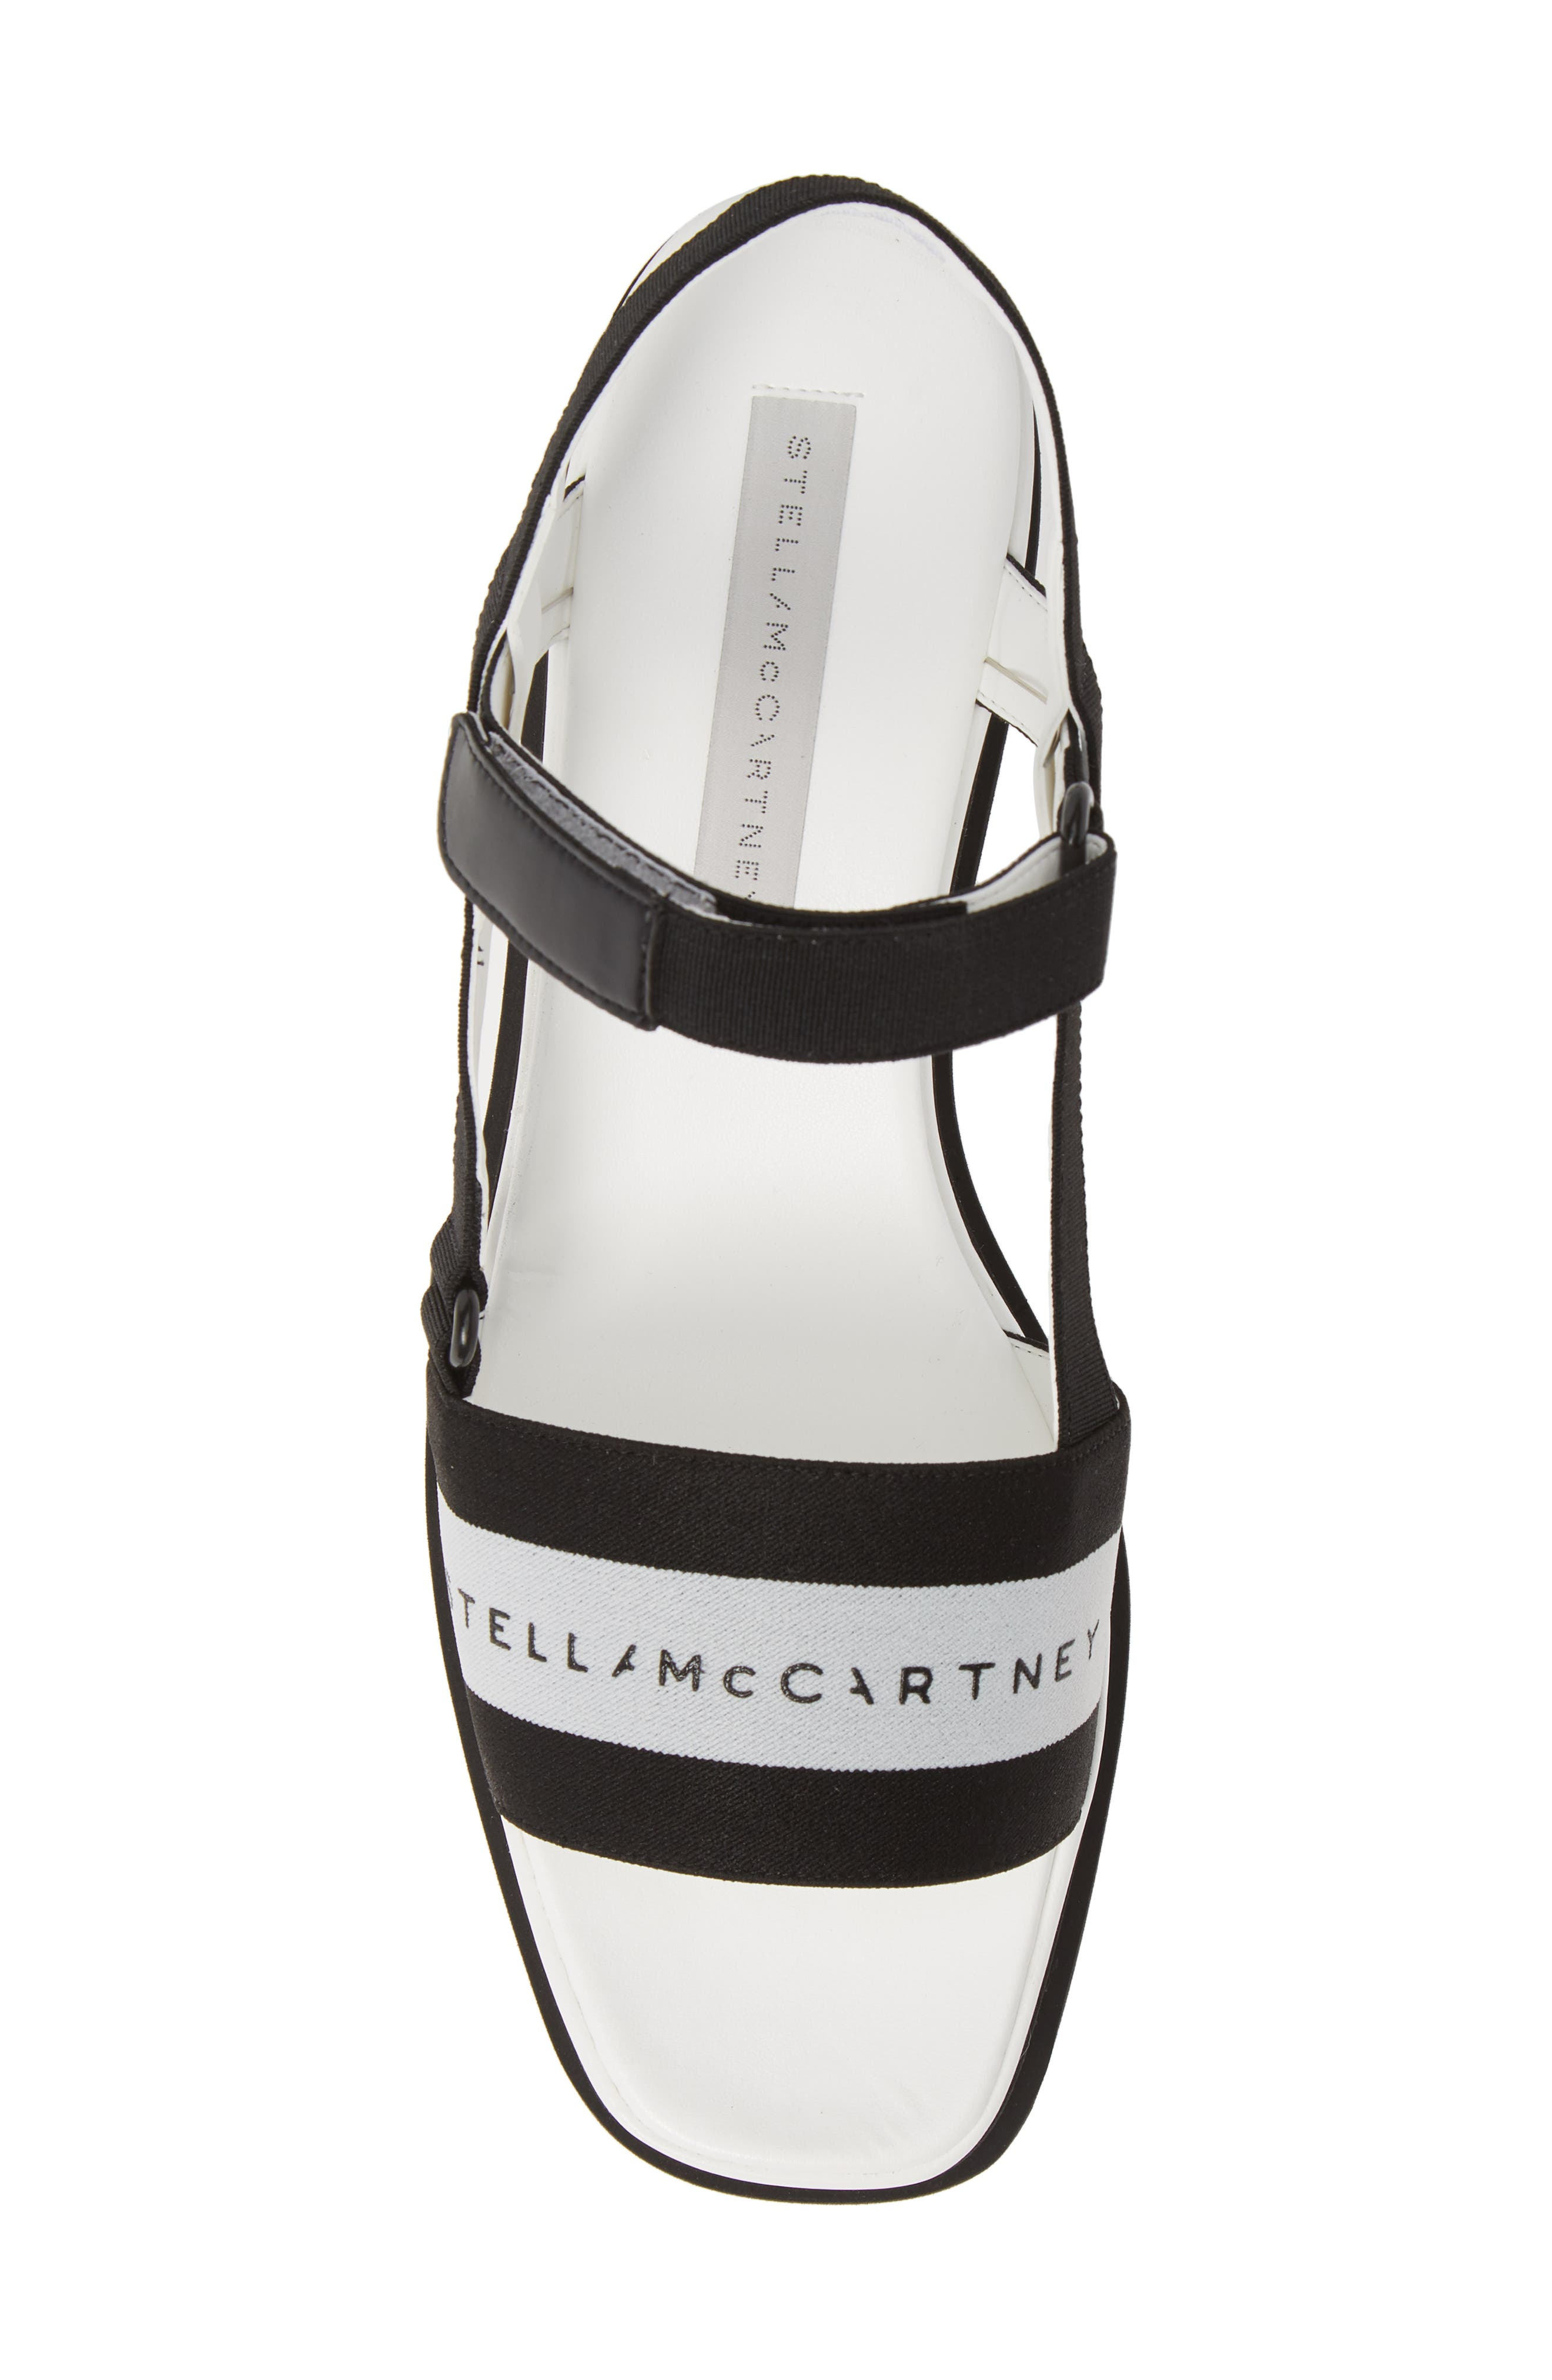 STELLA MCCARTNEY, Stripe Logo Platform Sandal, Alternate thumbnail 5, color, BLACK/ WHITE